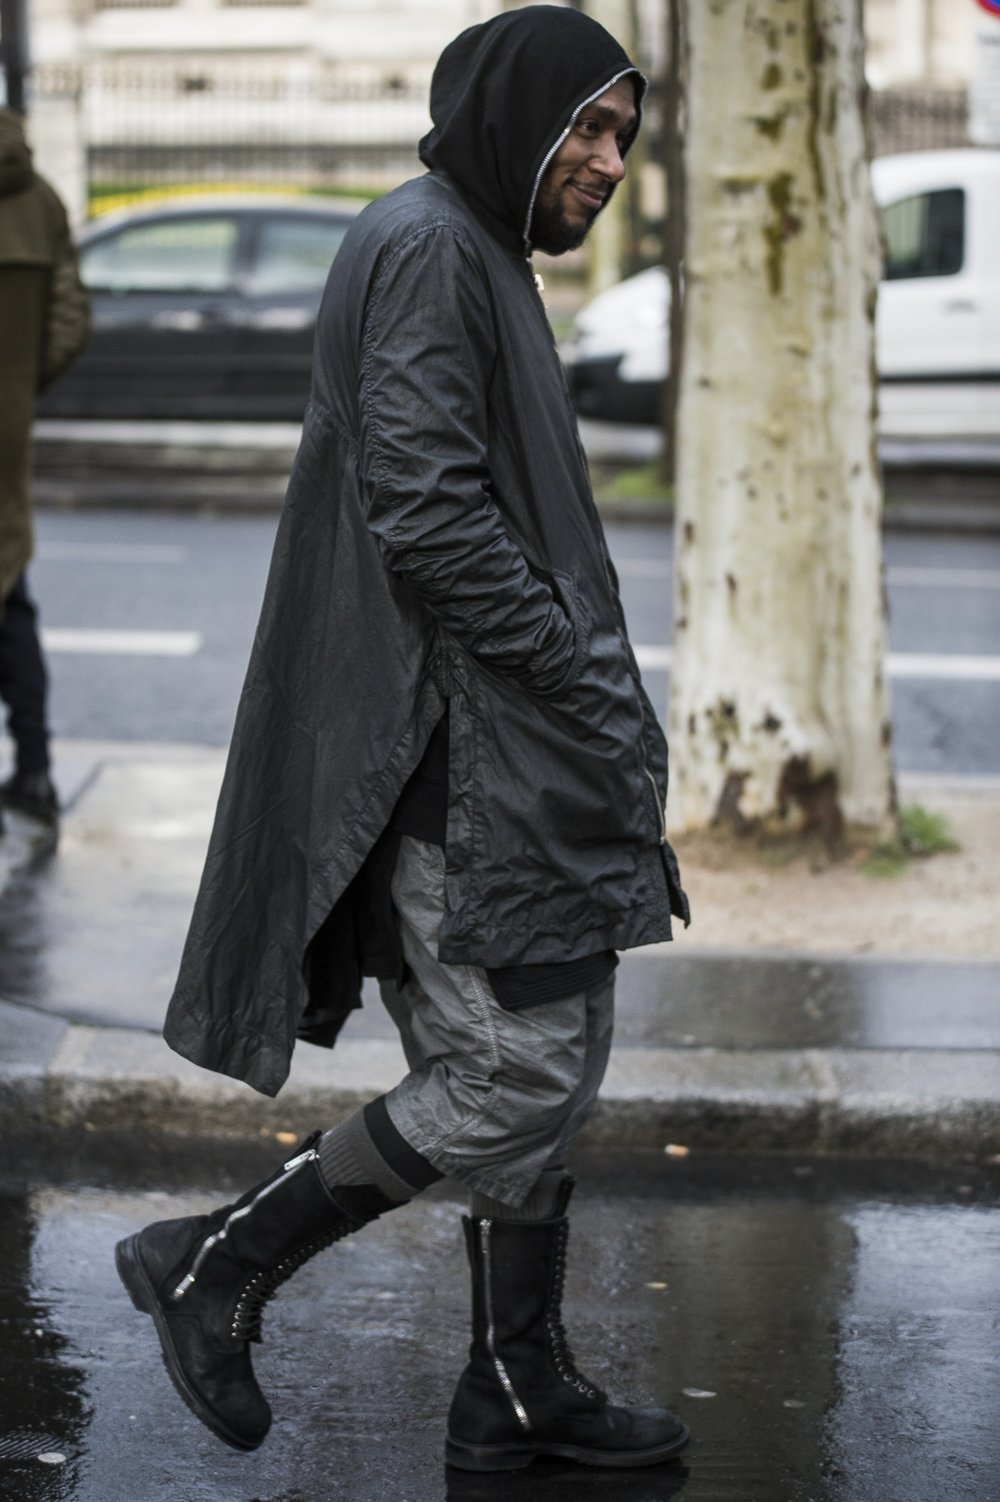 paris-fashion-week-fall-winter-2018-street-style-day-2-08-1.jpg